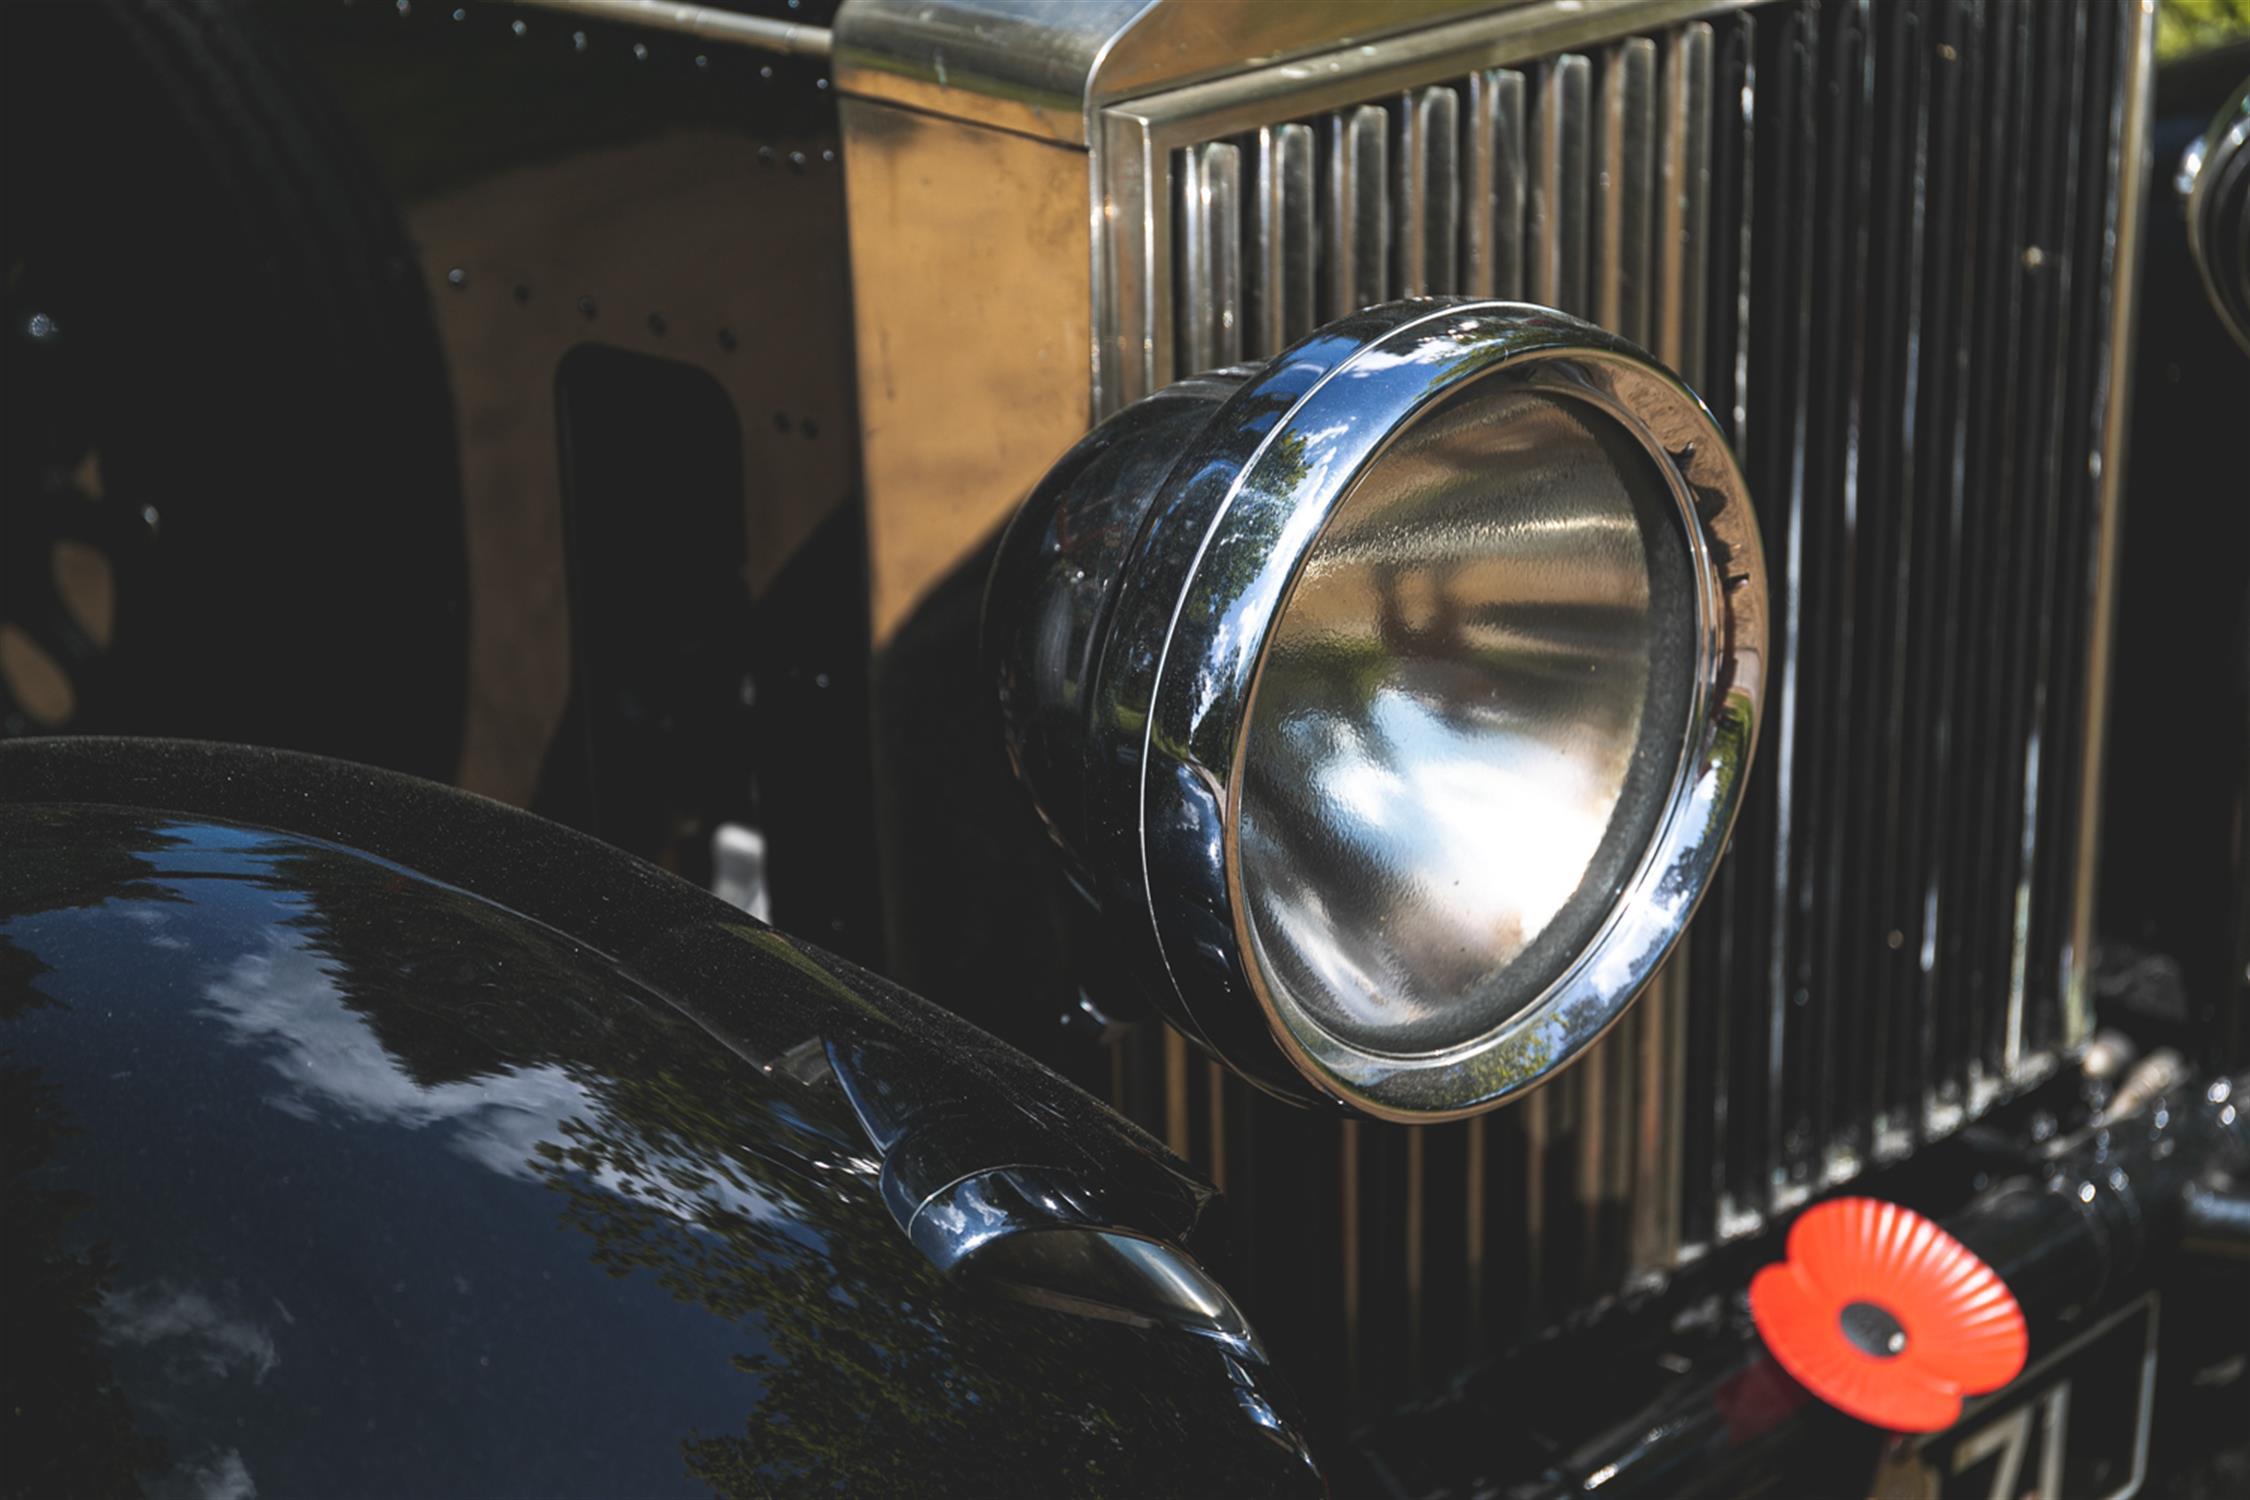 1927 Rolls-Royce Phantom 1 Open Tourer - Image 10 of 10